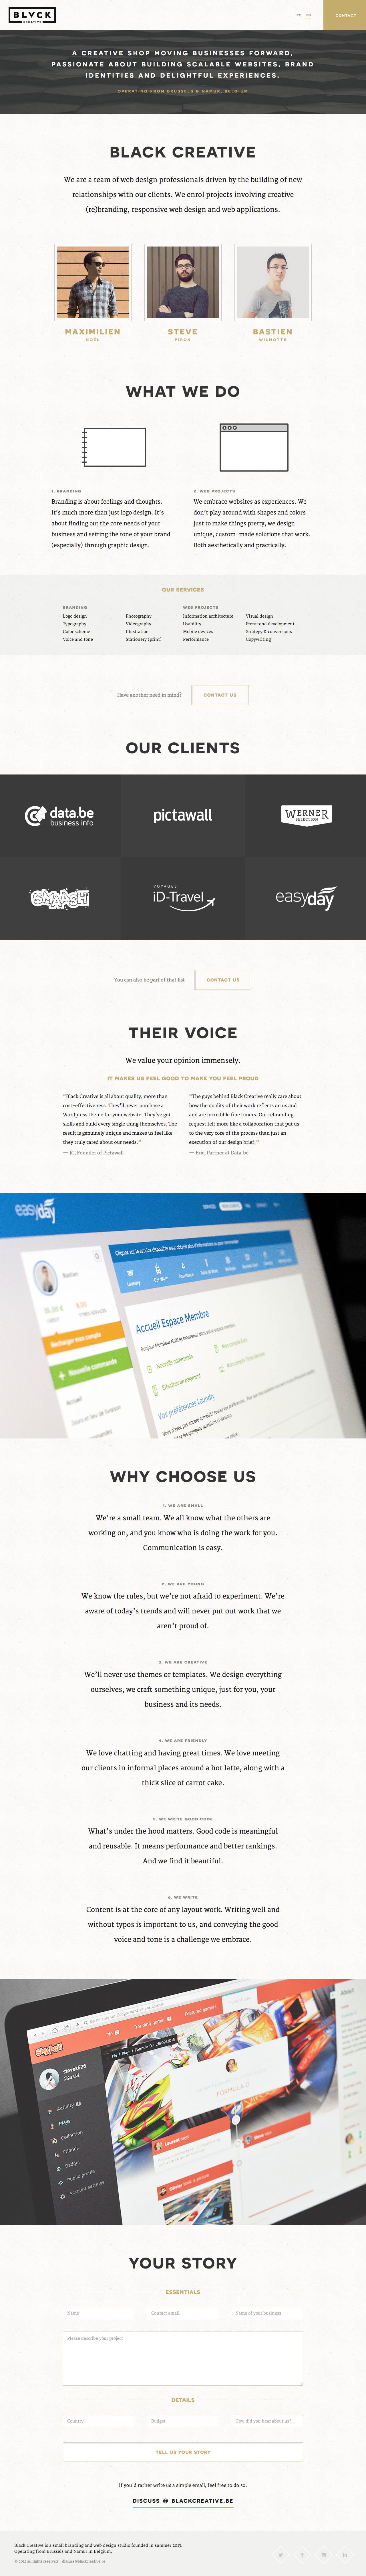 Black Creative Website Screenshot